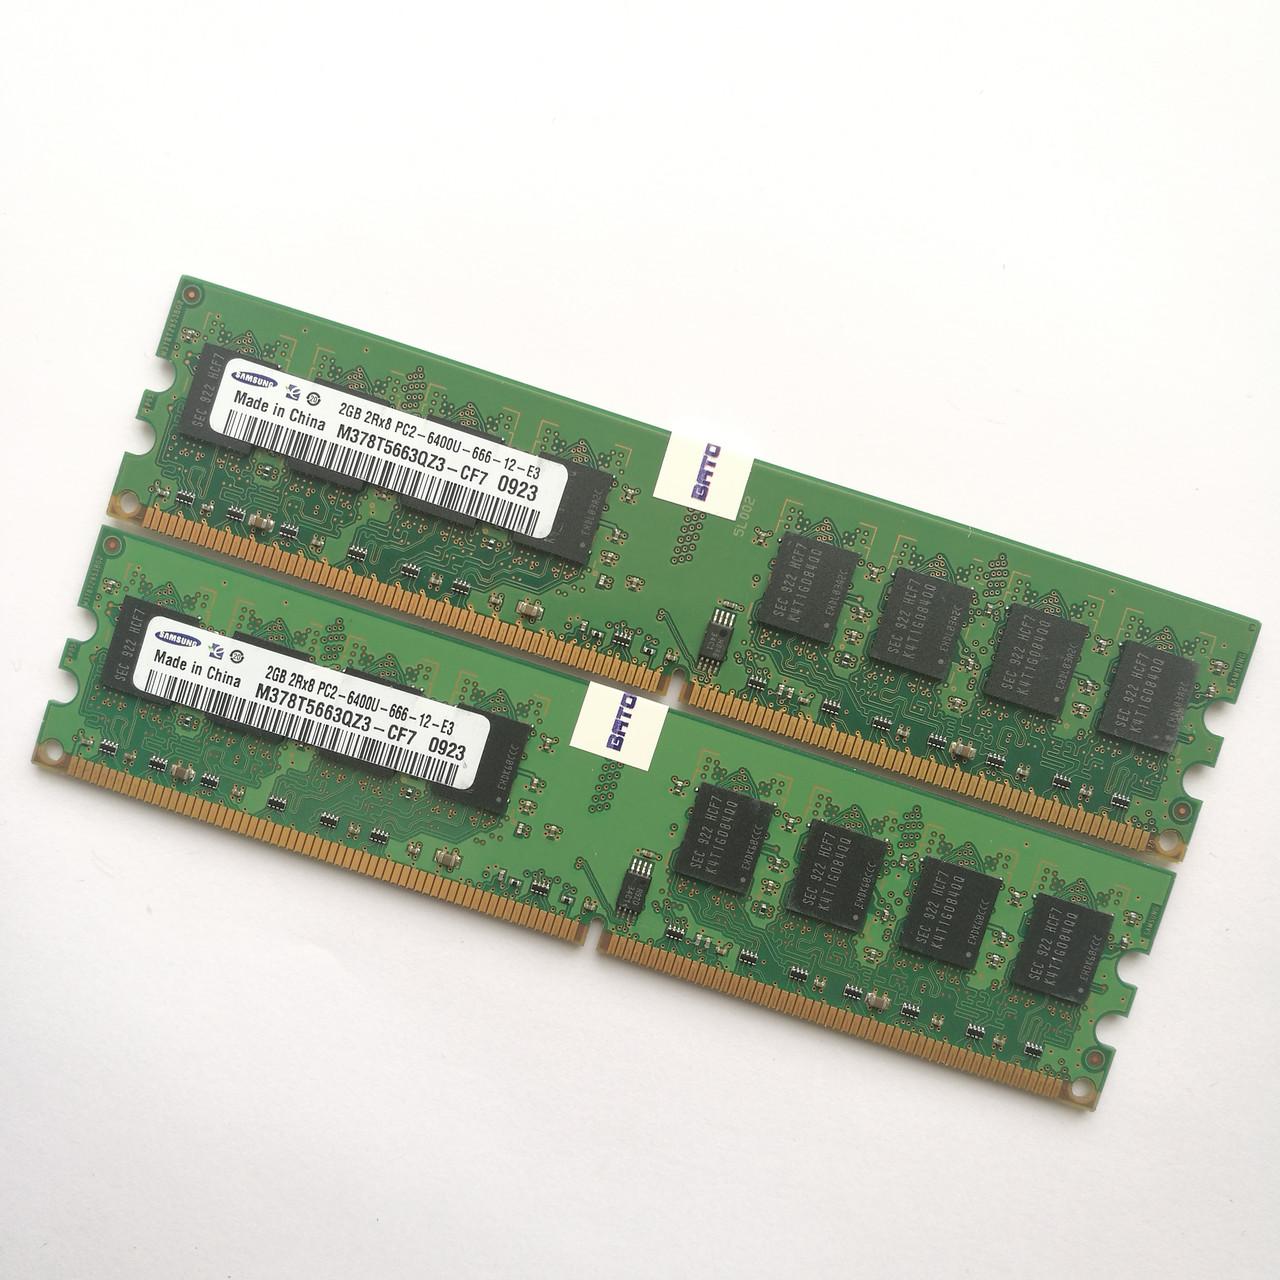 Пара оперативной памяти Samsung DDR2 4Gb (2Gb+2Gb) 800MHz PC2 6400U CL6 (M378T5663QZ3-CF7) Б/У